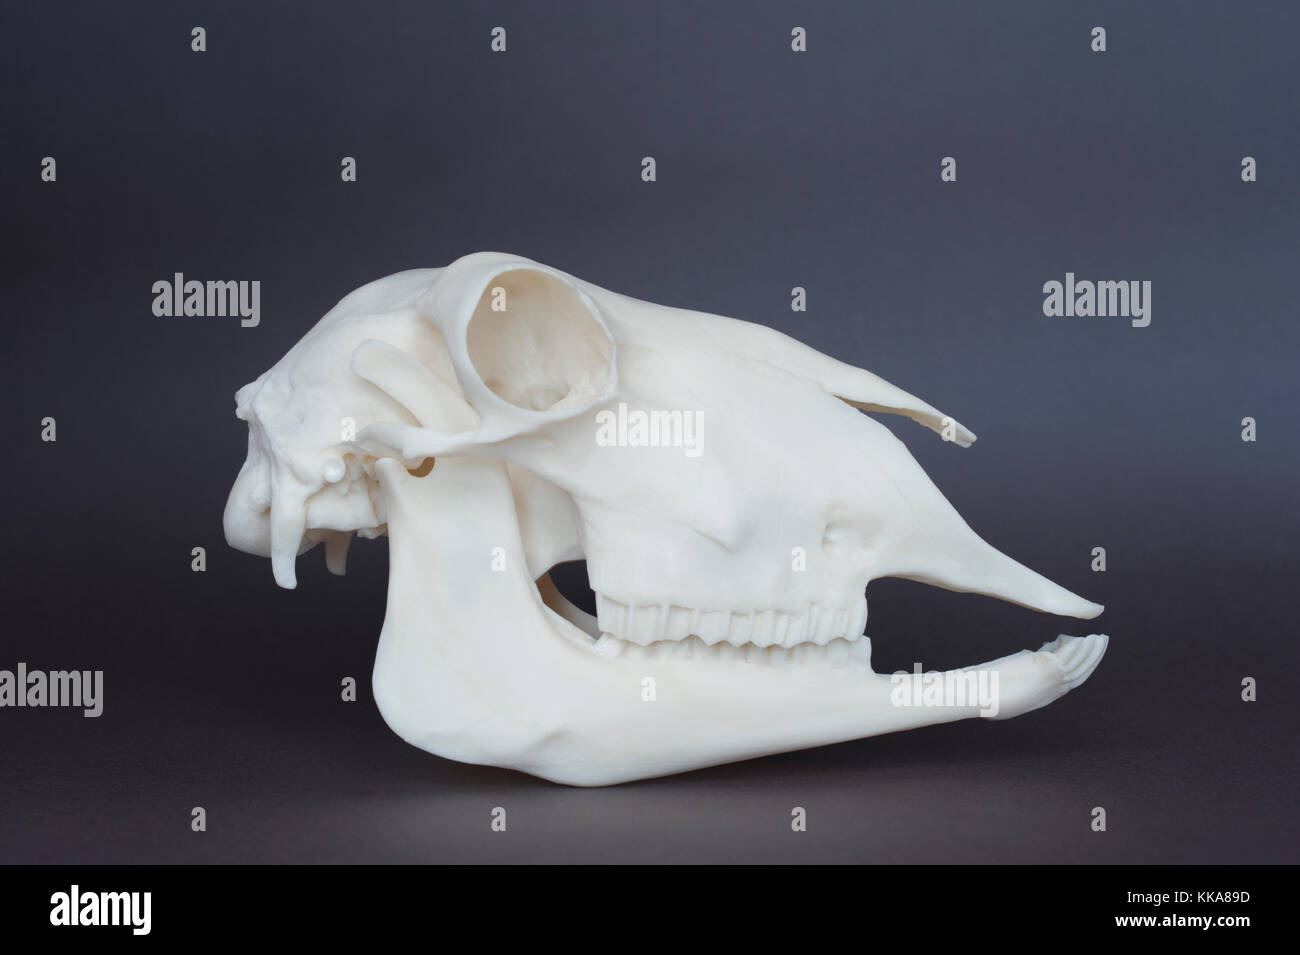 Incisor Teeth Stock Photos & Incisor Teeth Stock Images - Alamy